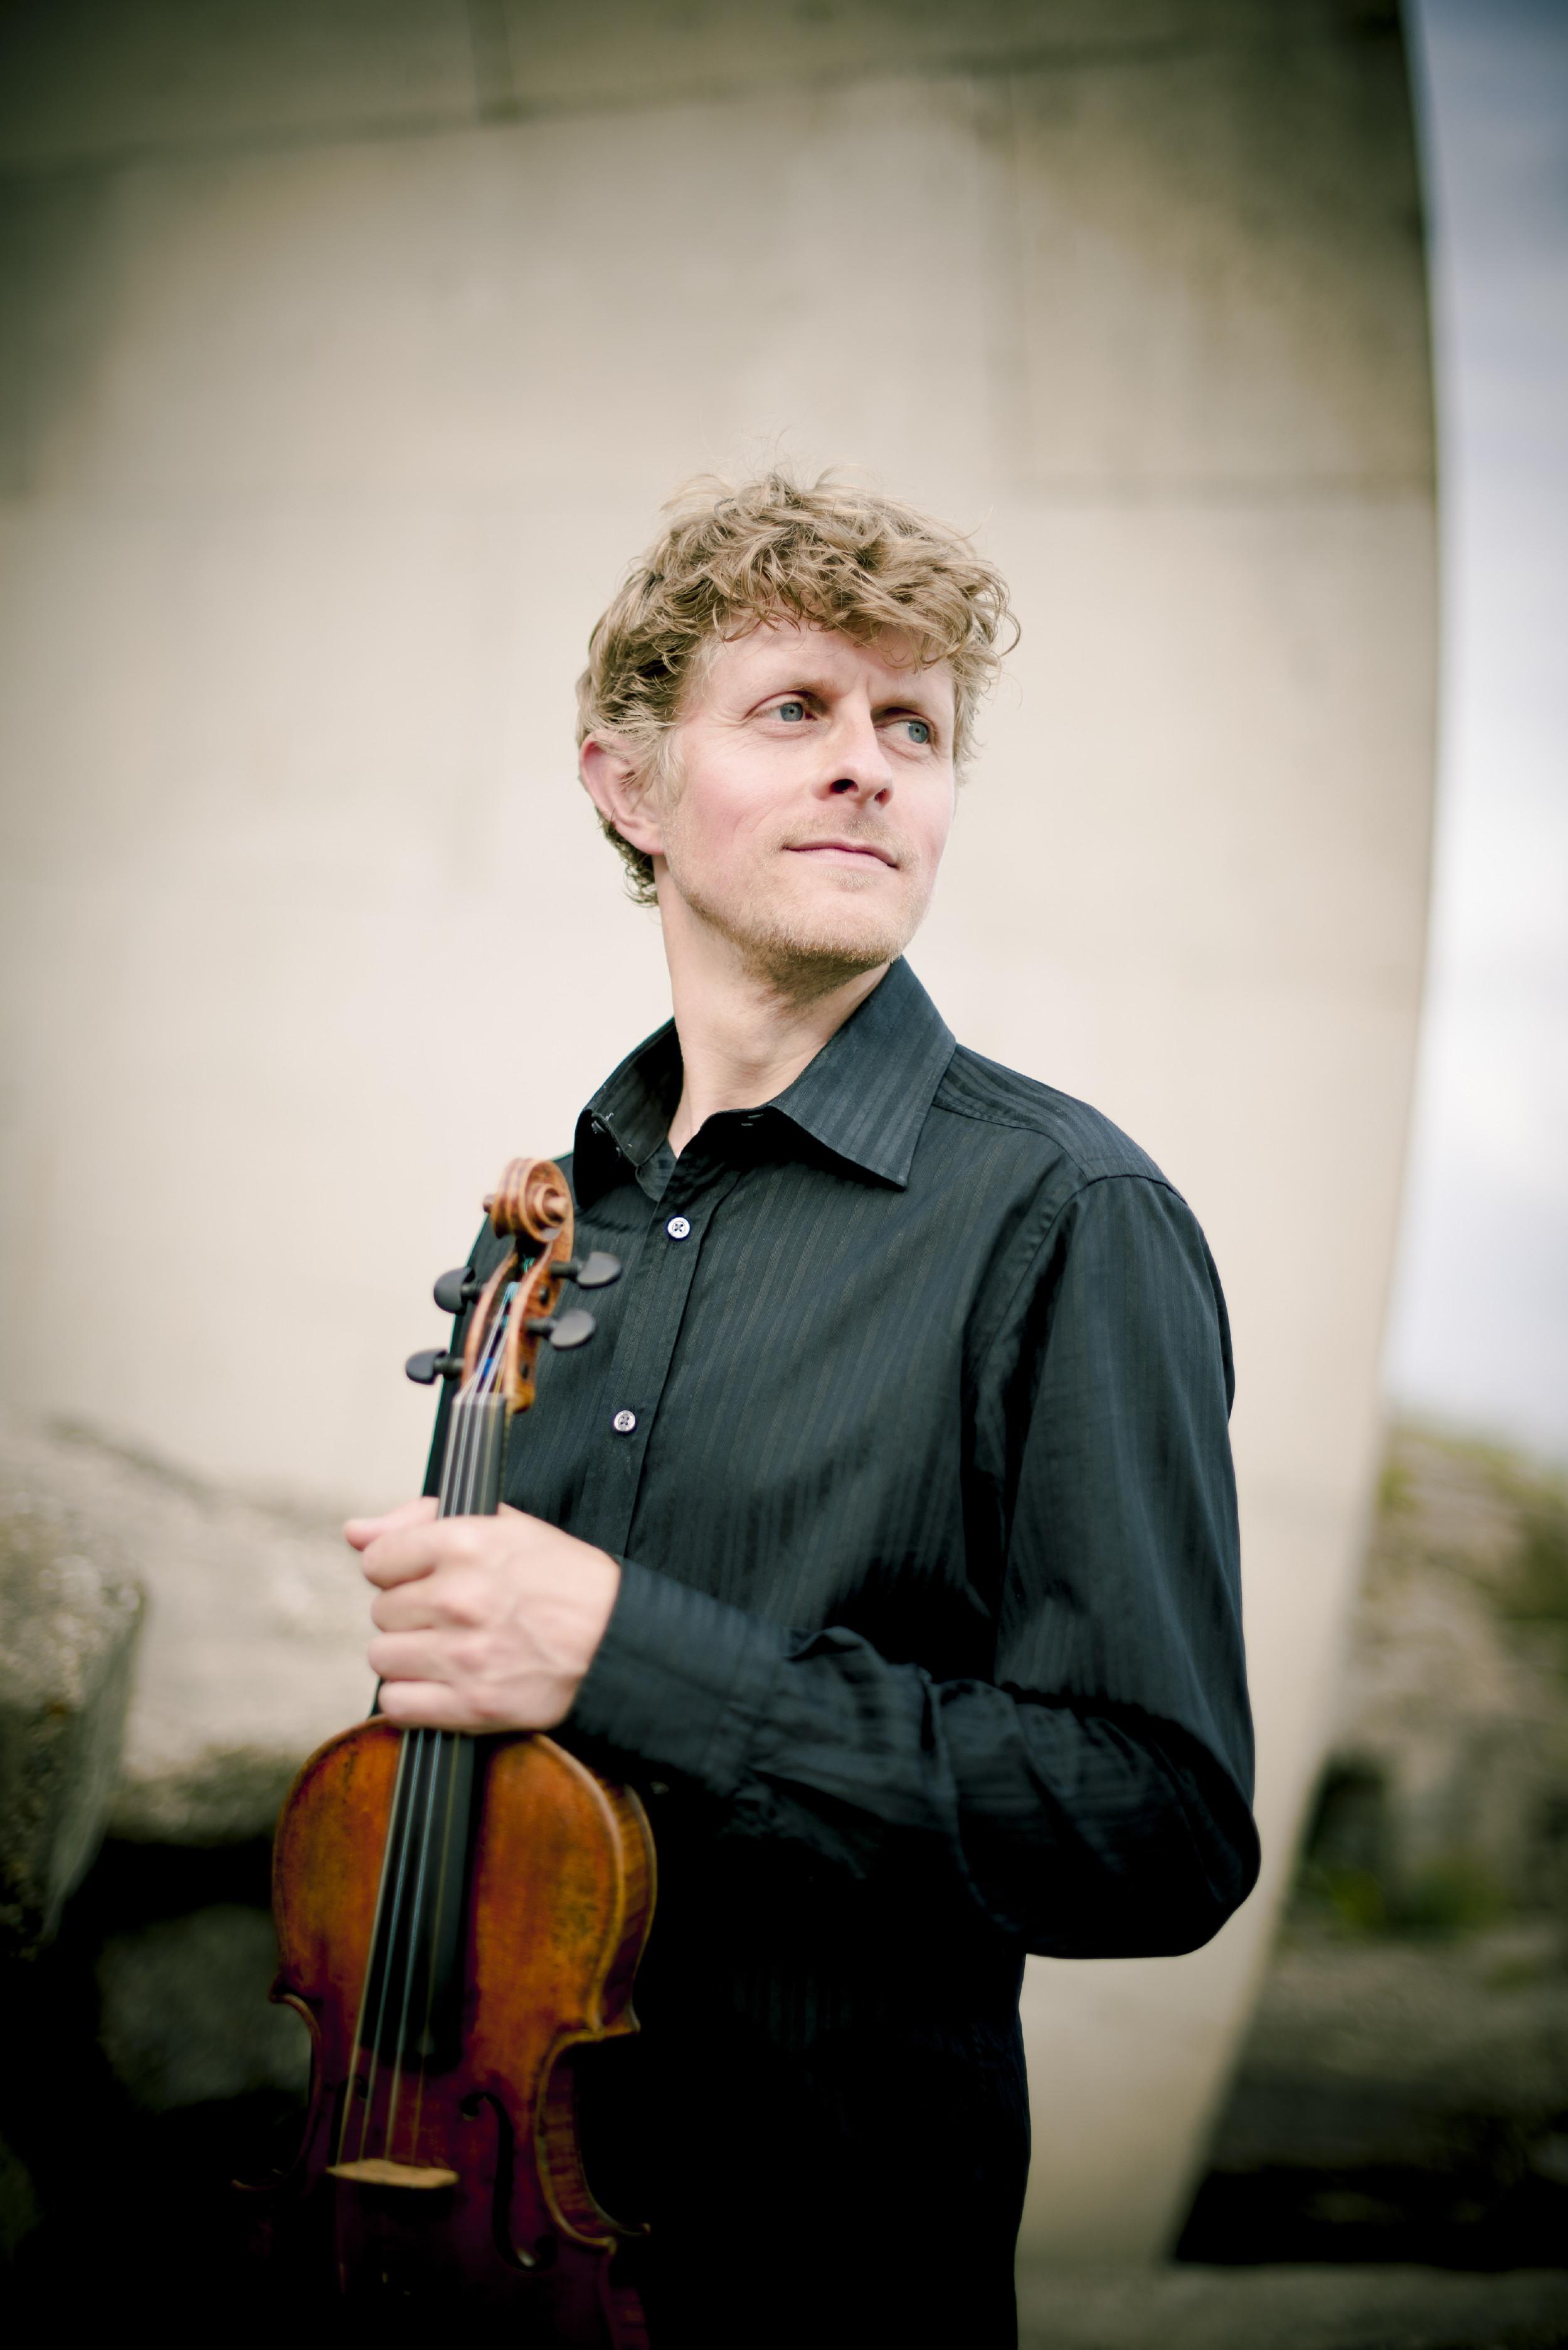 Gypsy Jazz Strings - Workshop by Tim Kiliphuis